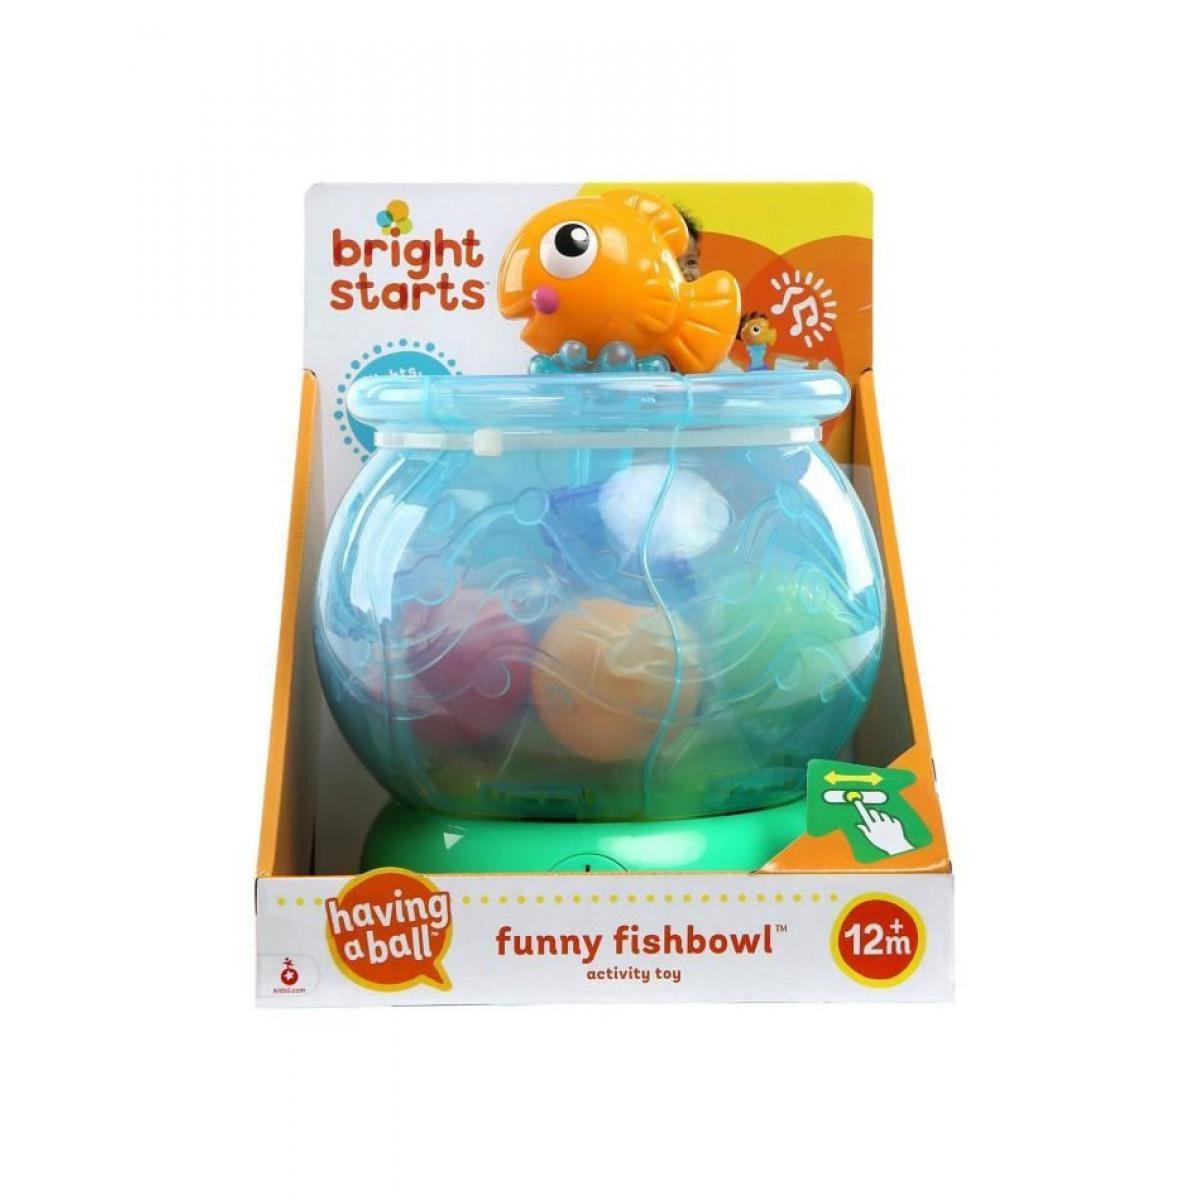 Bright Starts BRIGHT STARTS Jouet d'éveil Funny Fishbowl